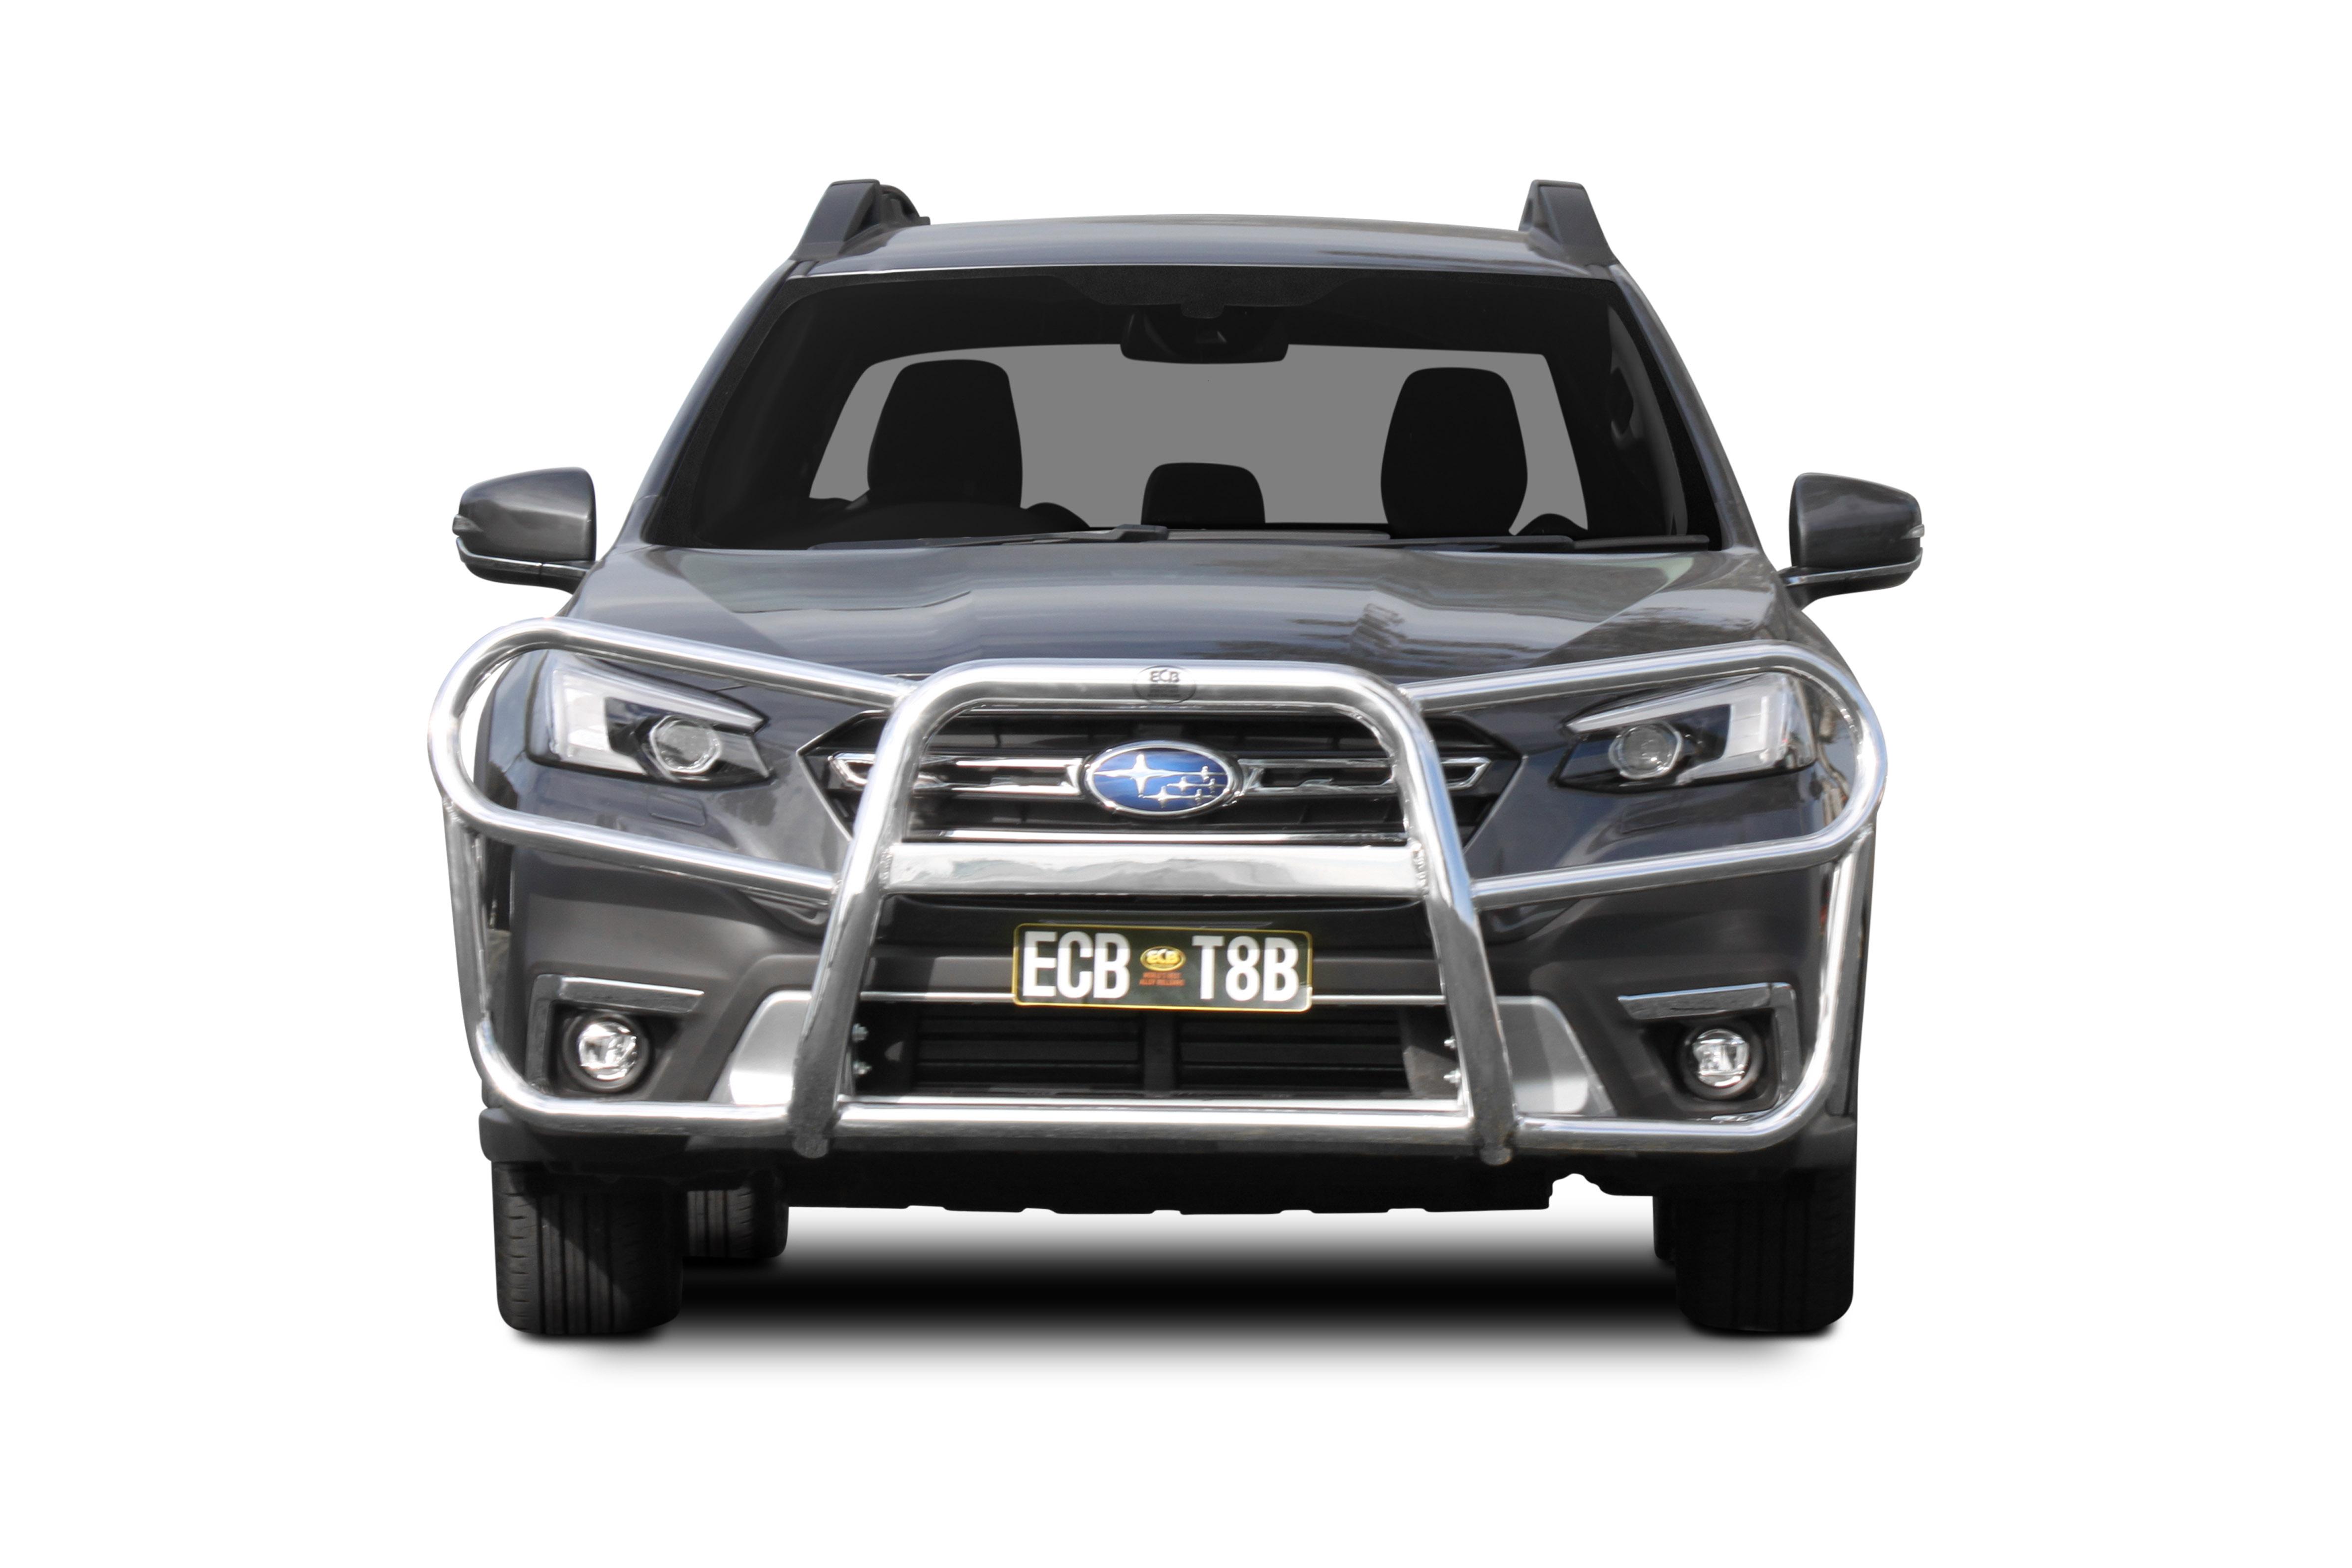 SUBARU OUTBACK  Subaru Outback Type 8 Bar (12/20 to )